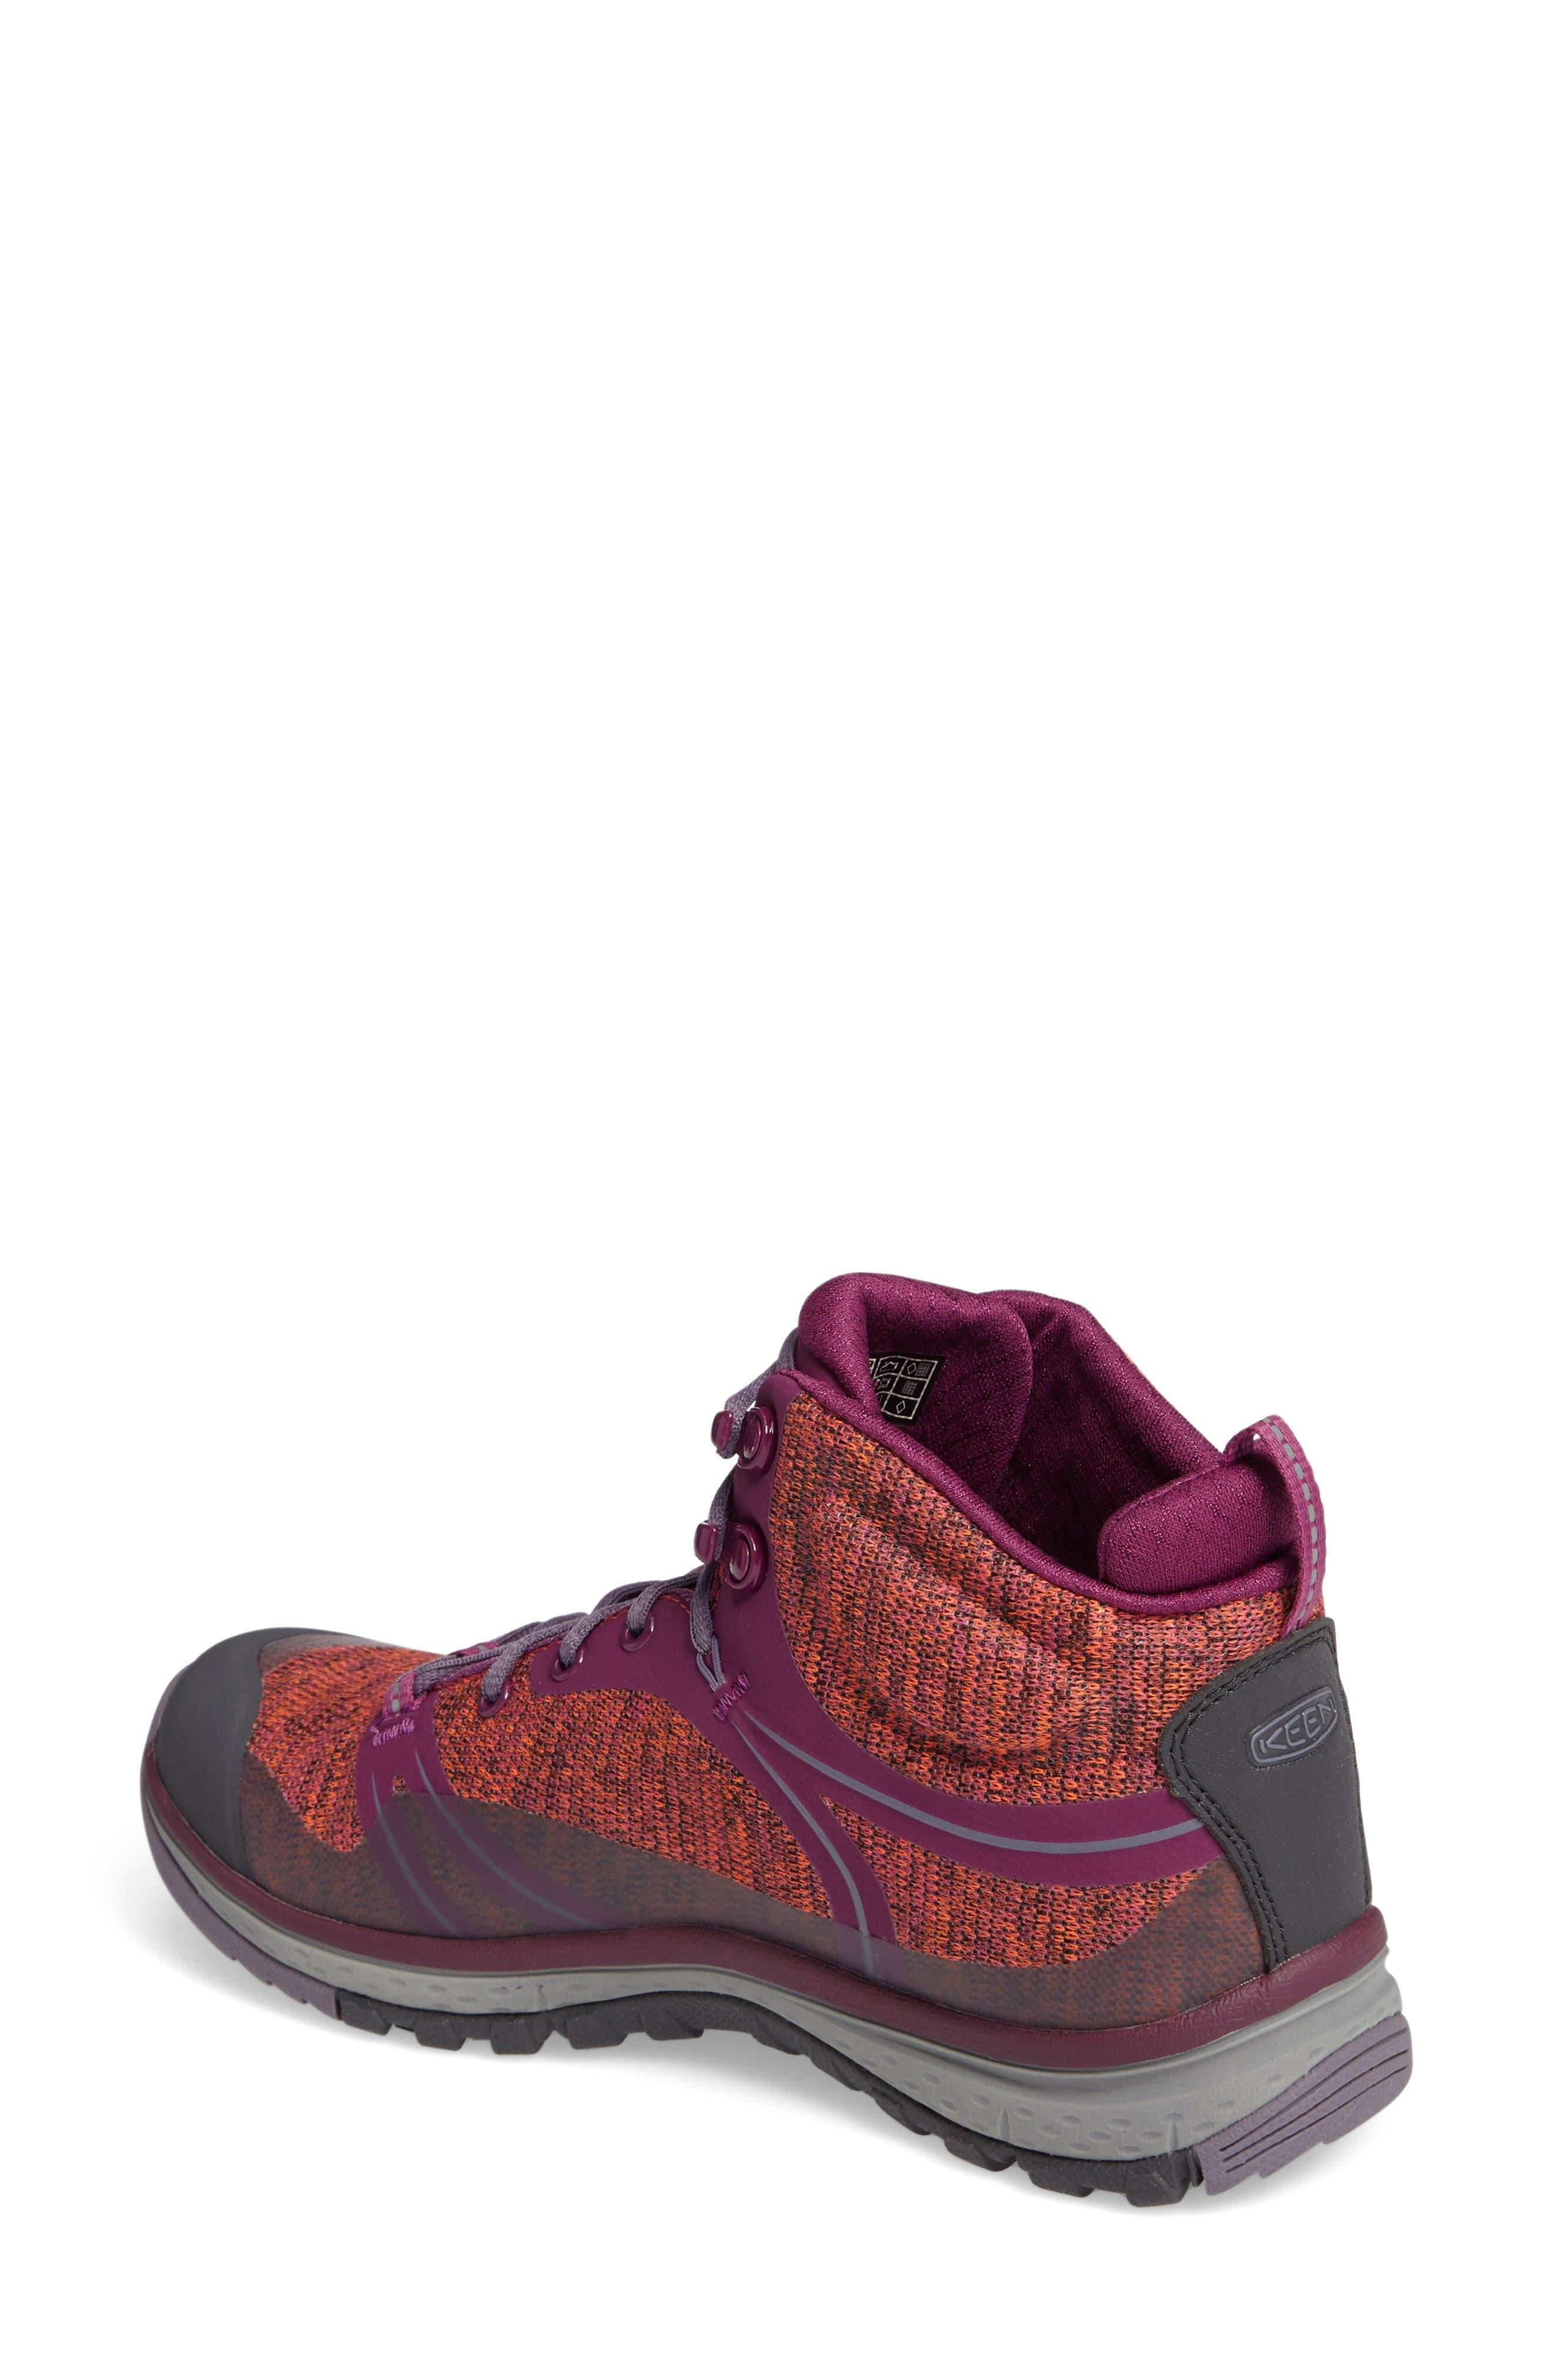 Alternate Image 2  - Keen Terradora Waterproof Hiking Boot (Women)